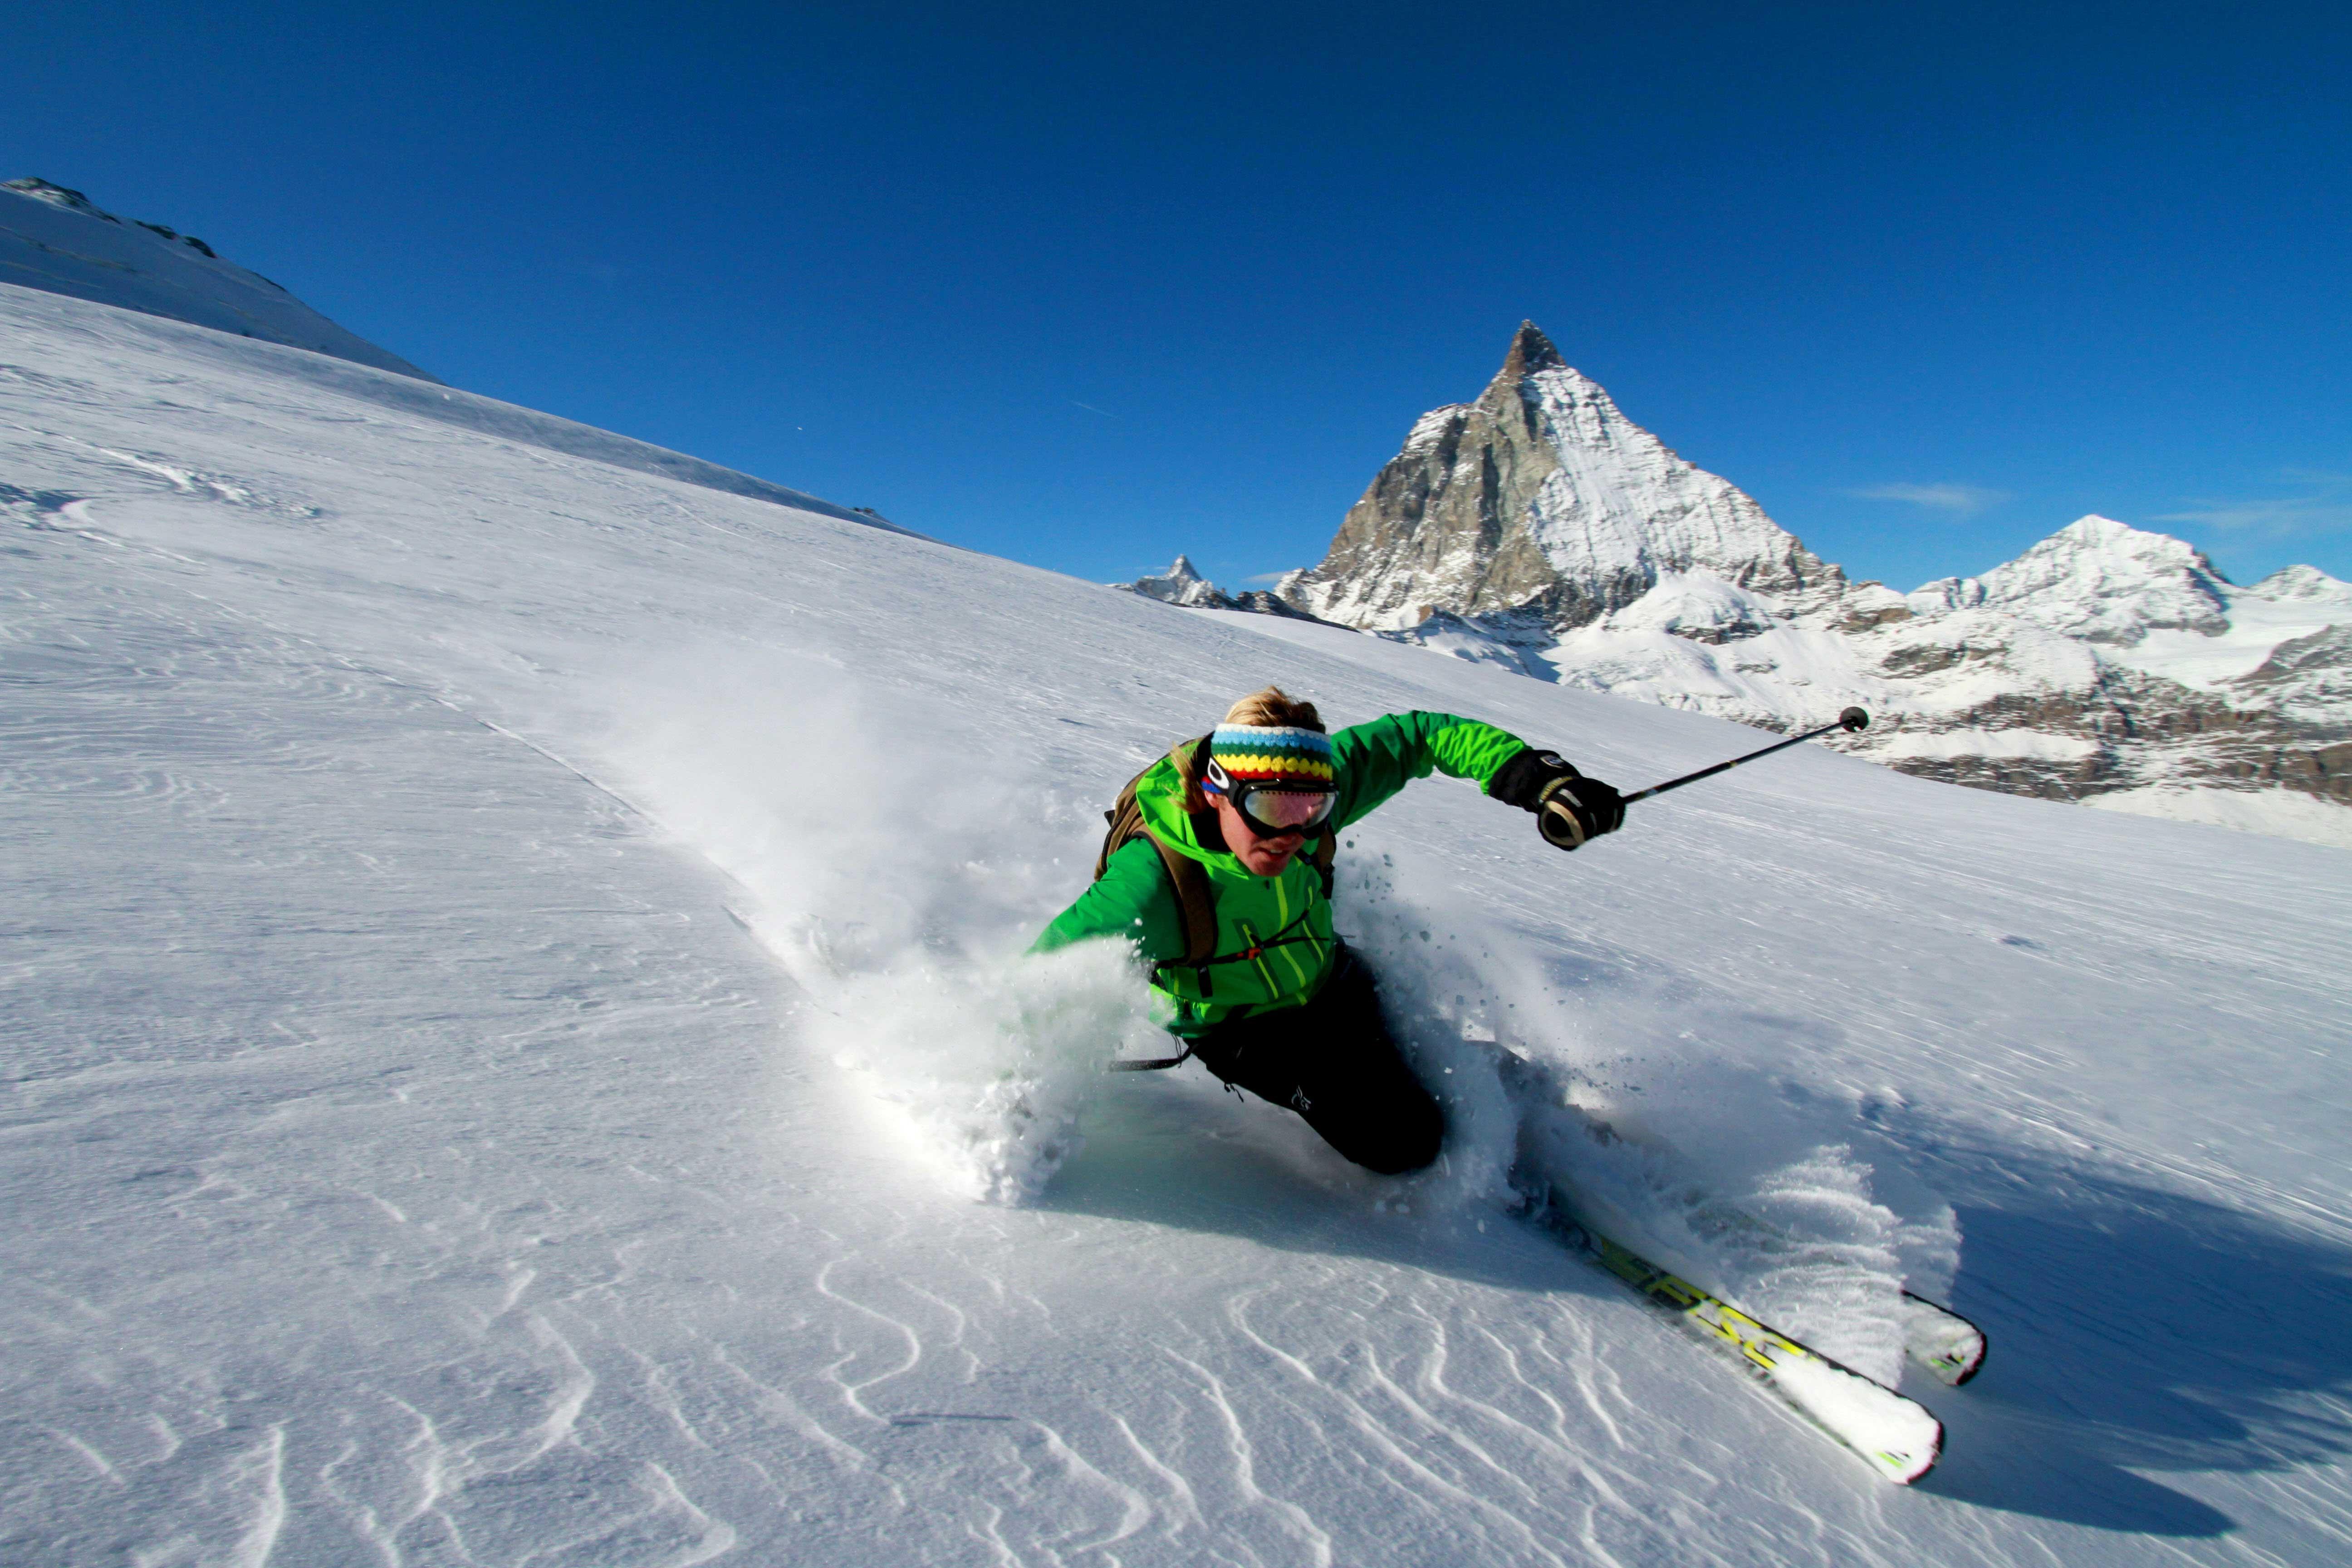 ski2-copy-2